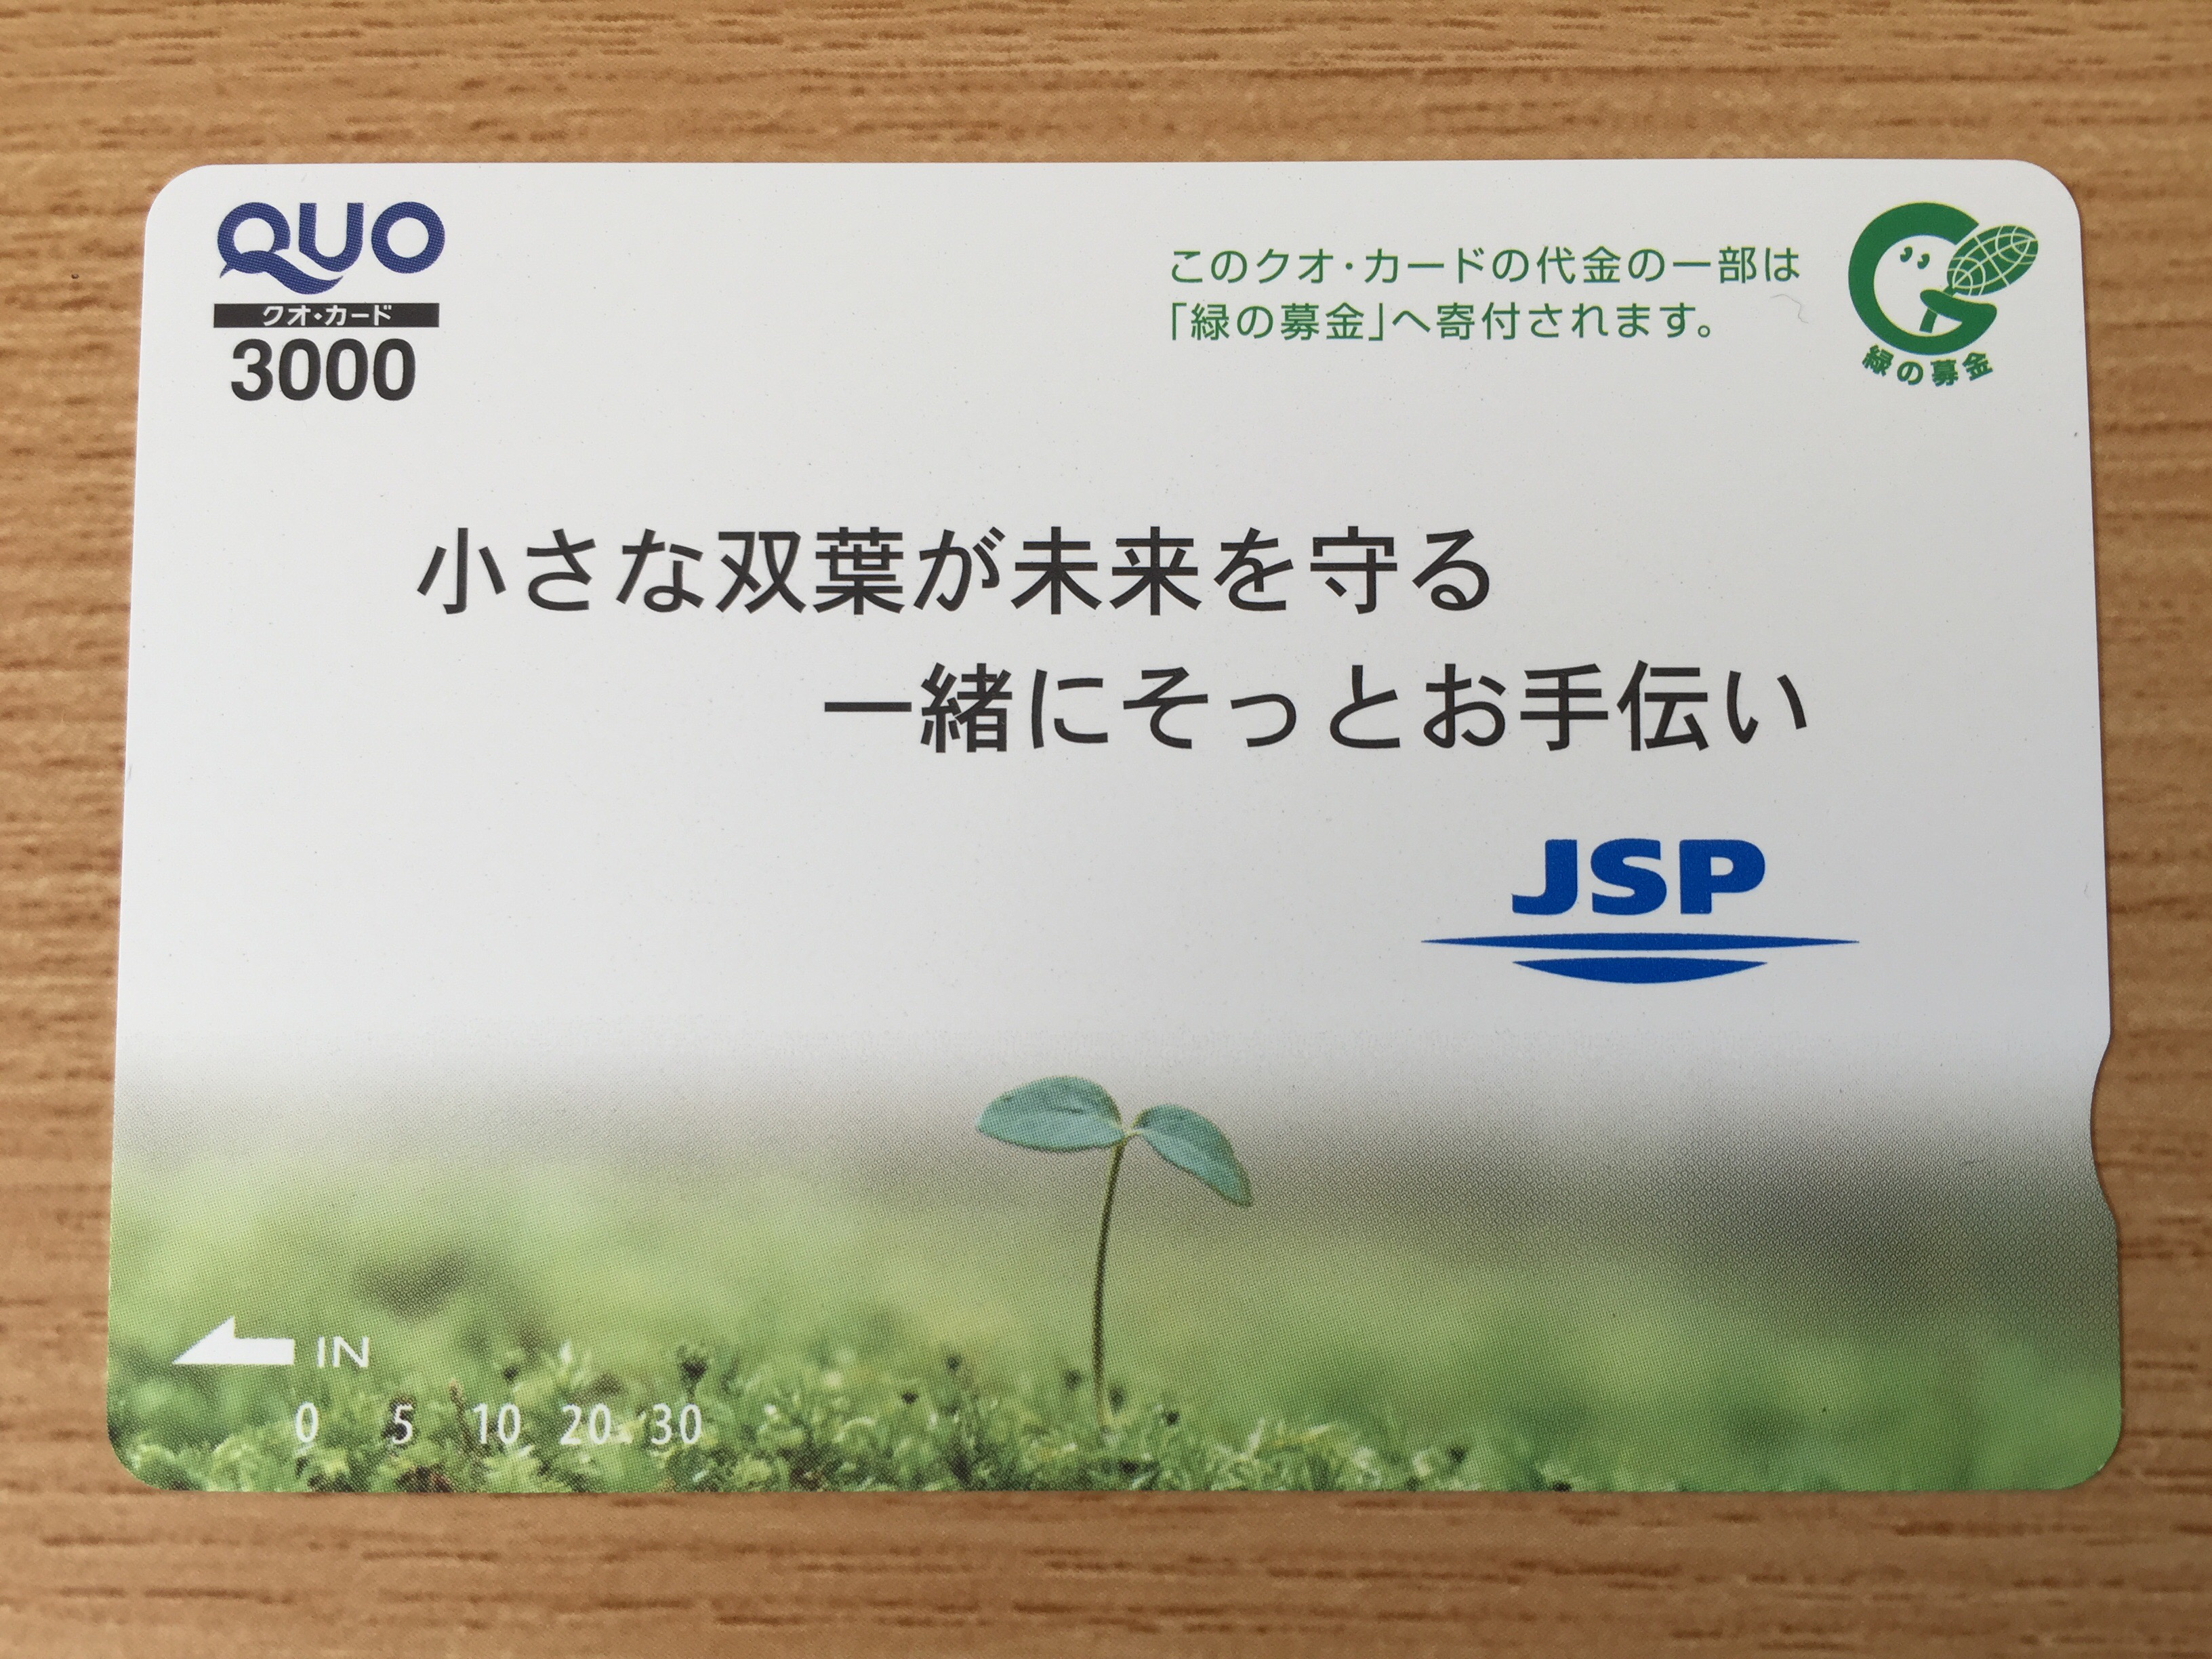 JSPから株主優待 3,000円分の高額クオカード